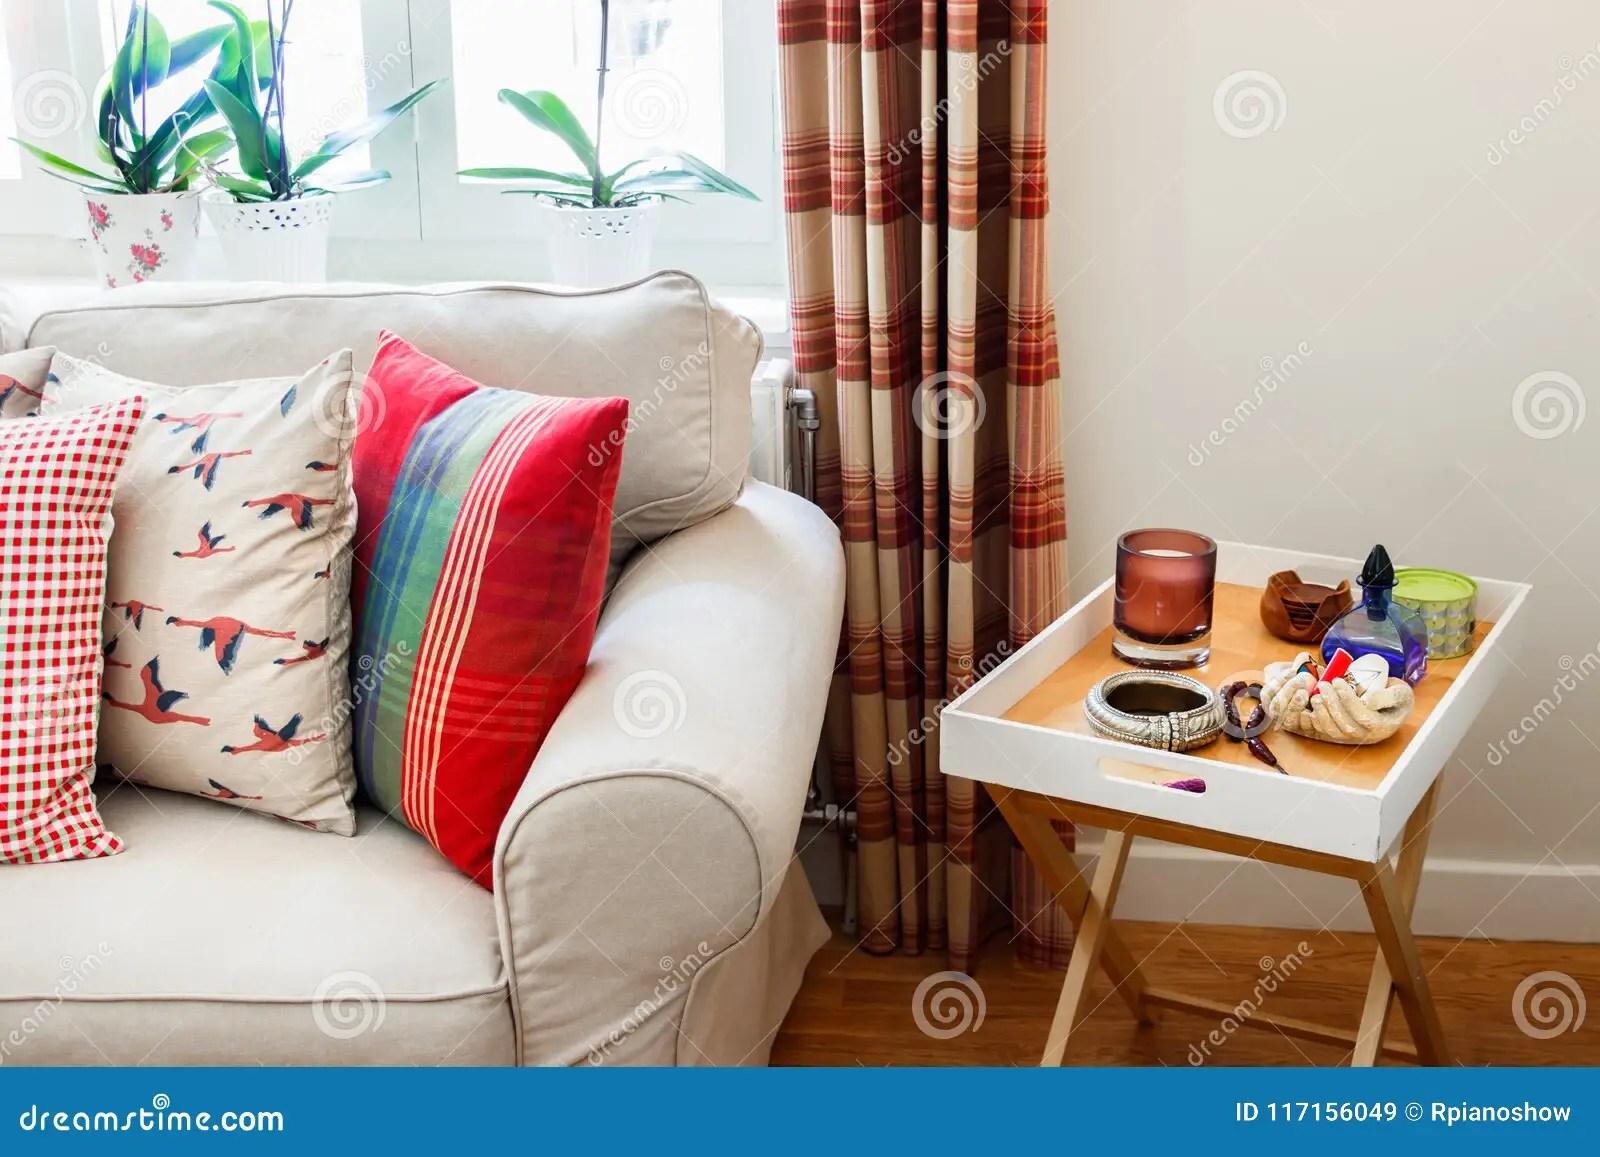 living room interior english